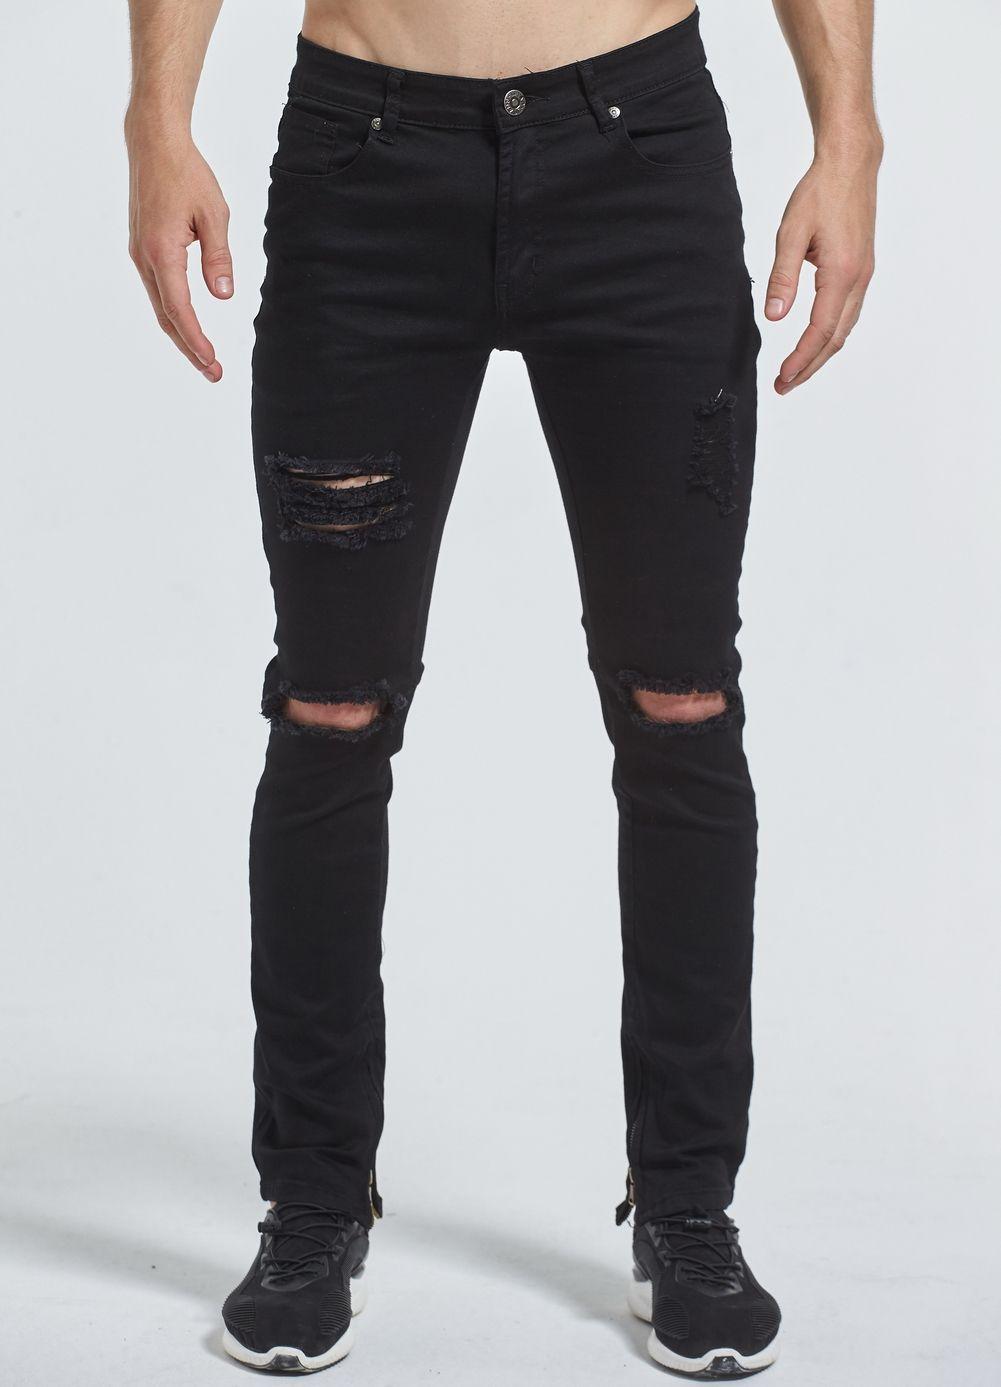 f4a3444289 Nuevos Hombres Stretch Skinny Jeans Rasgados Agujero Destruido Apenada  Urban Classic Moda Tobillo Cremallera Pantalones Vaqueros